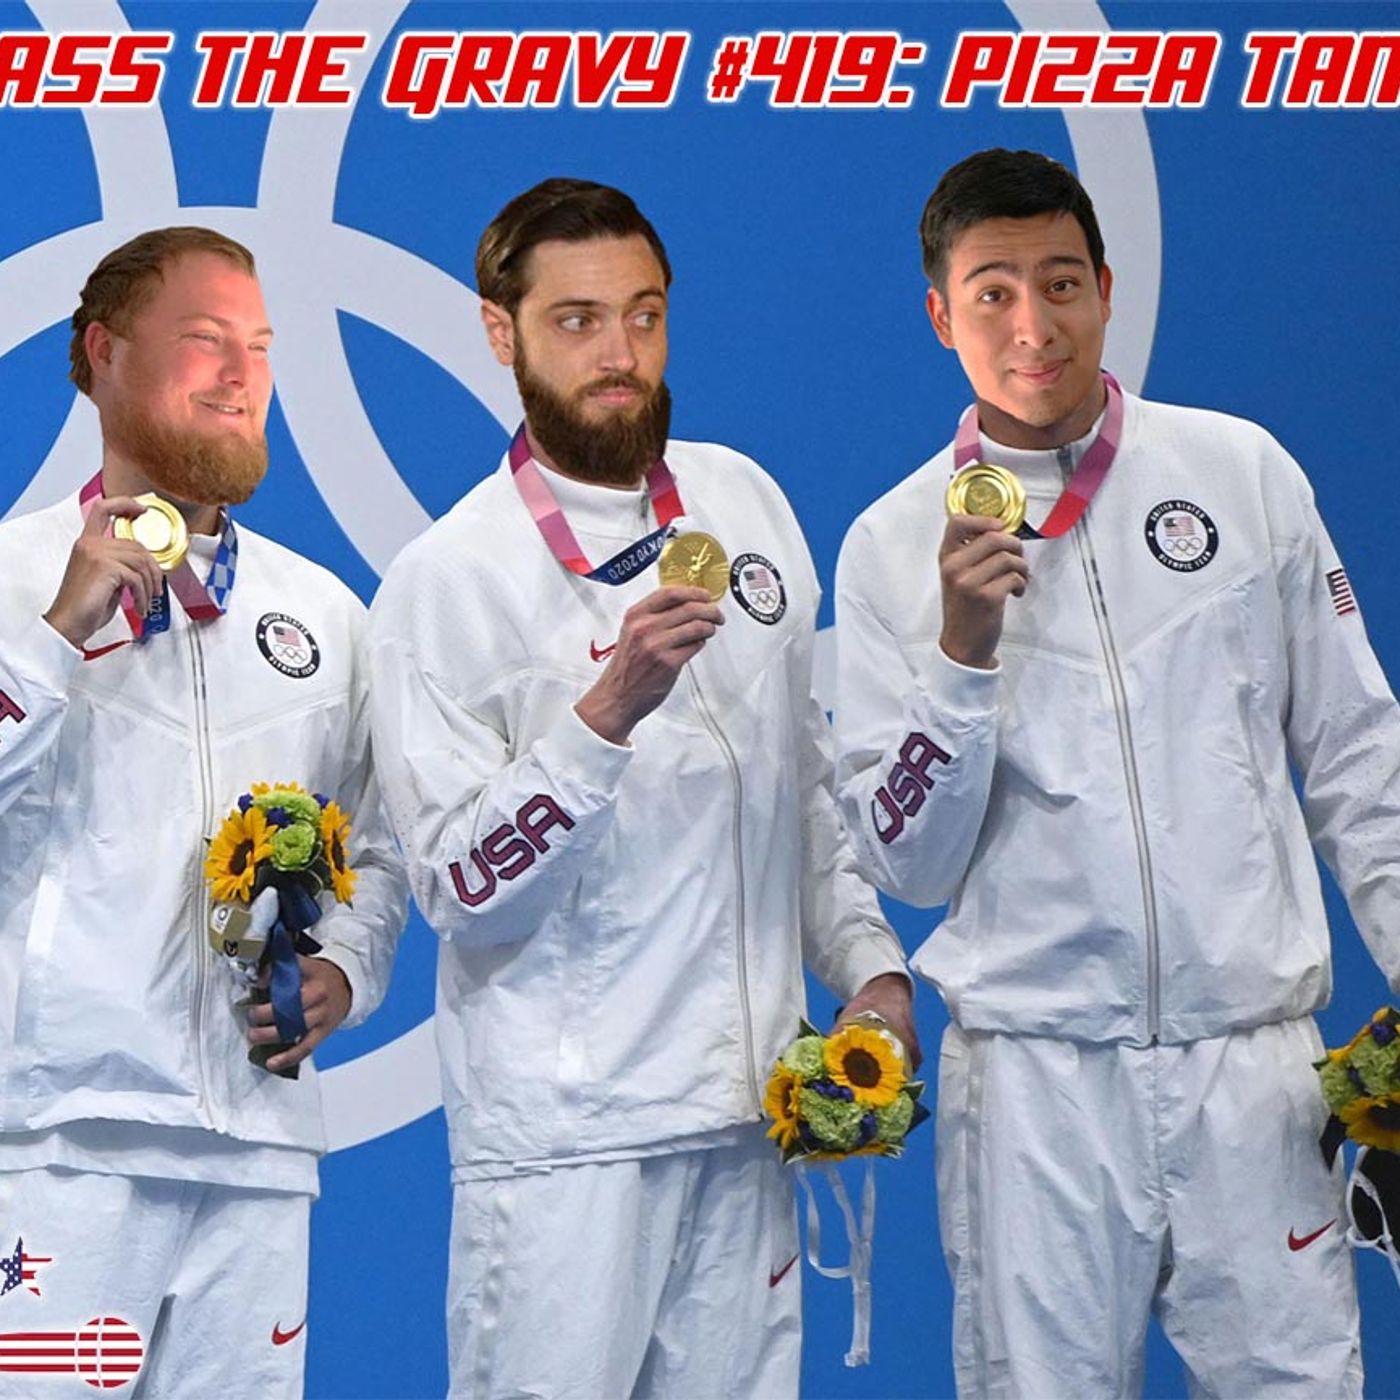 Pass The Gravy #419: Pizza Tank